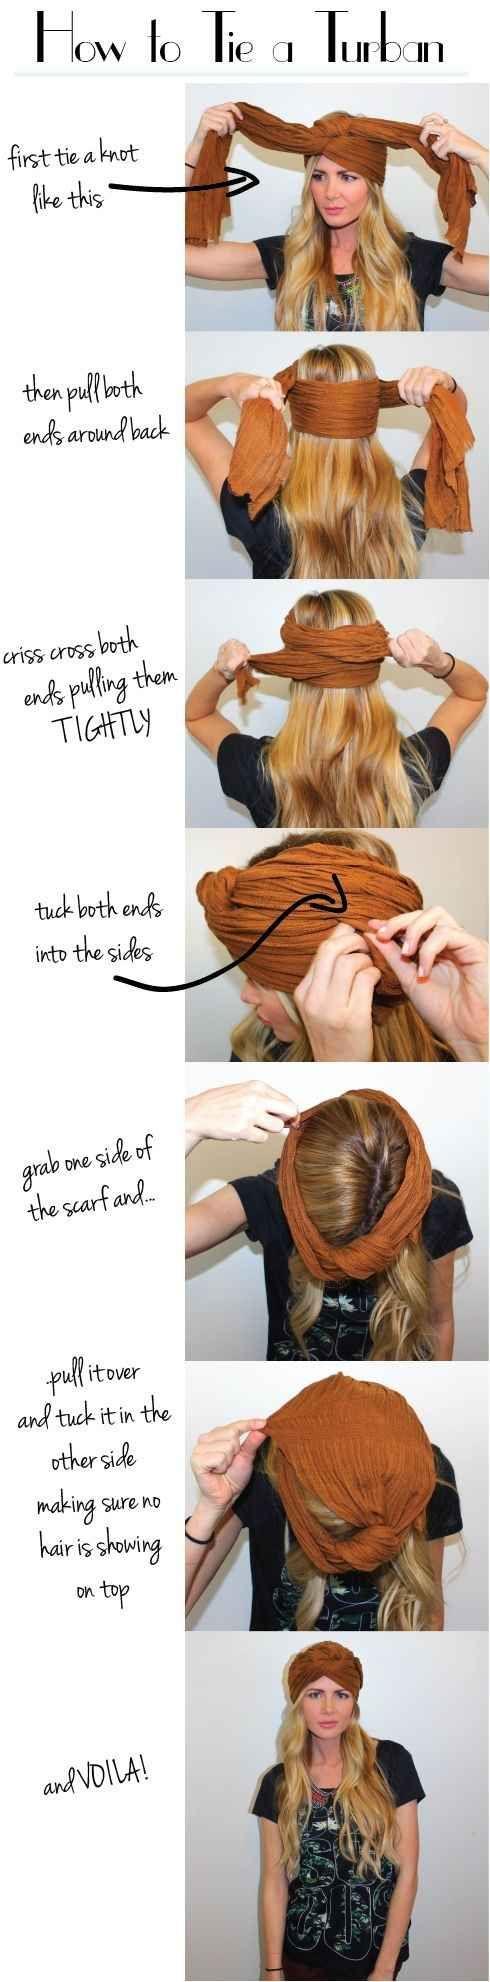 Tying a turban